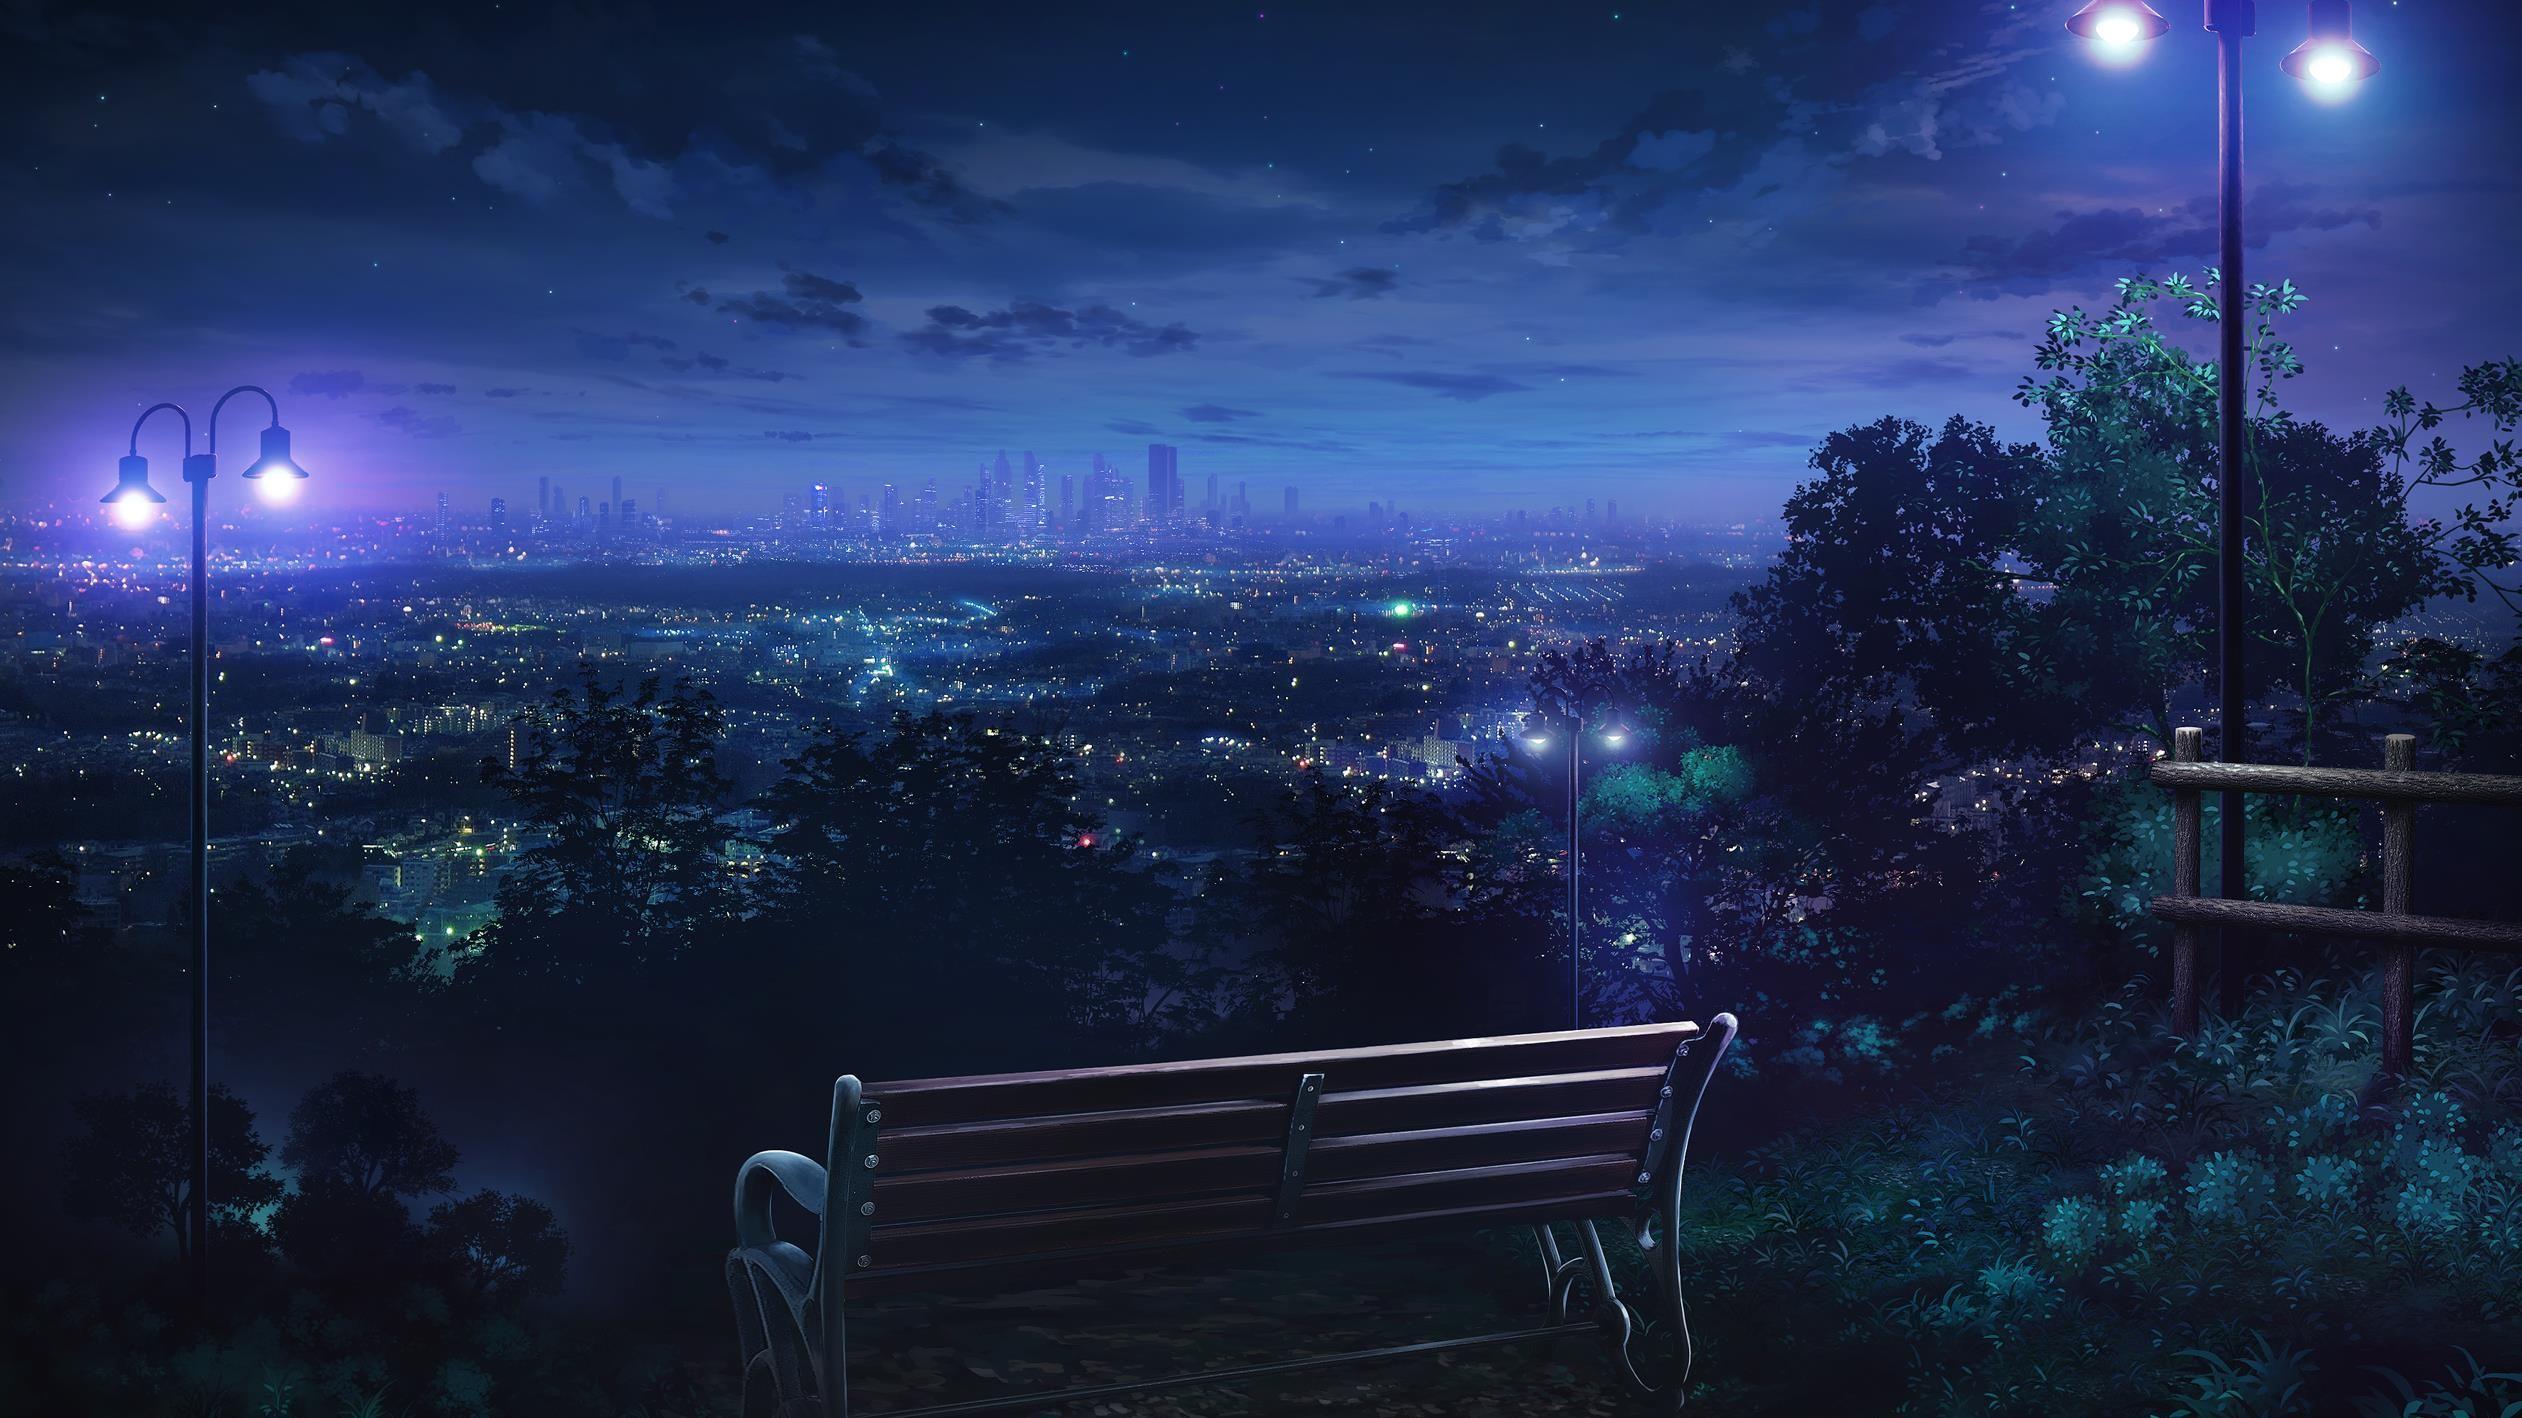 Nightly Wallpapers Cenário anime, Wallpaper paisagem, Anime